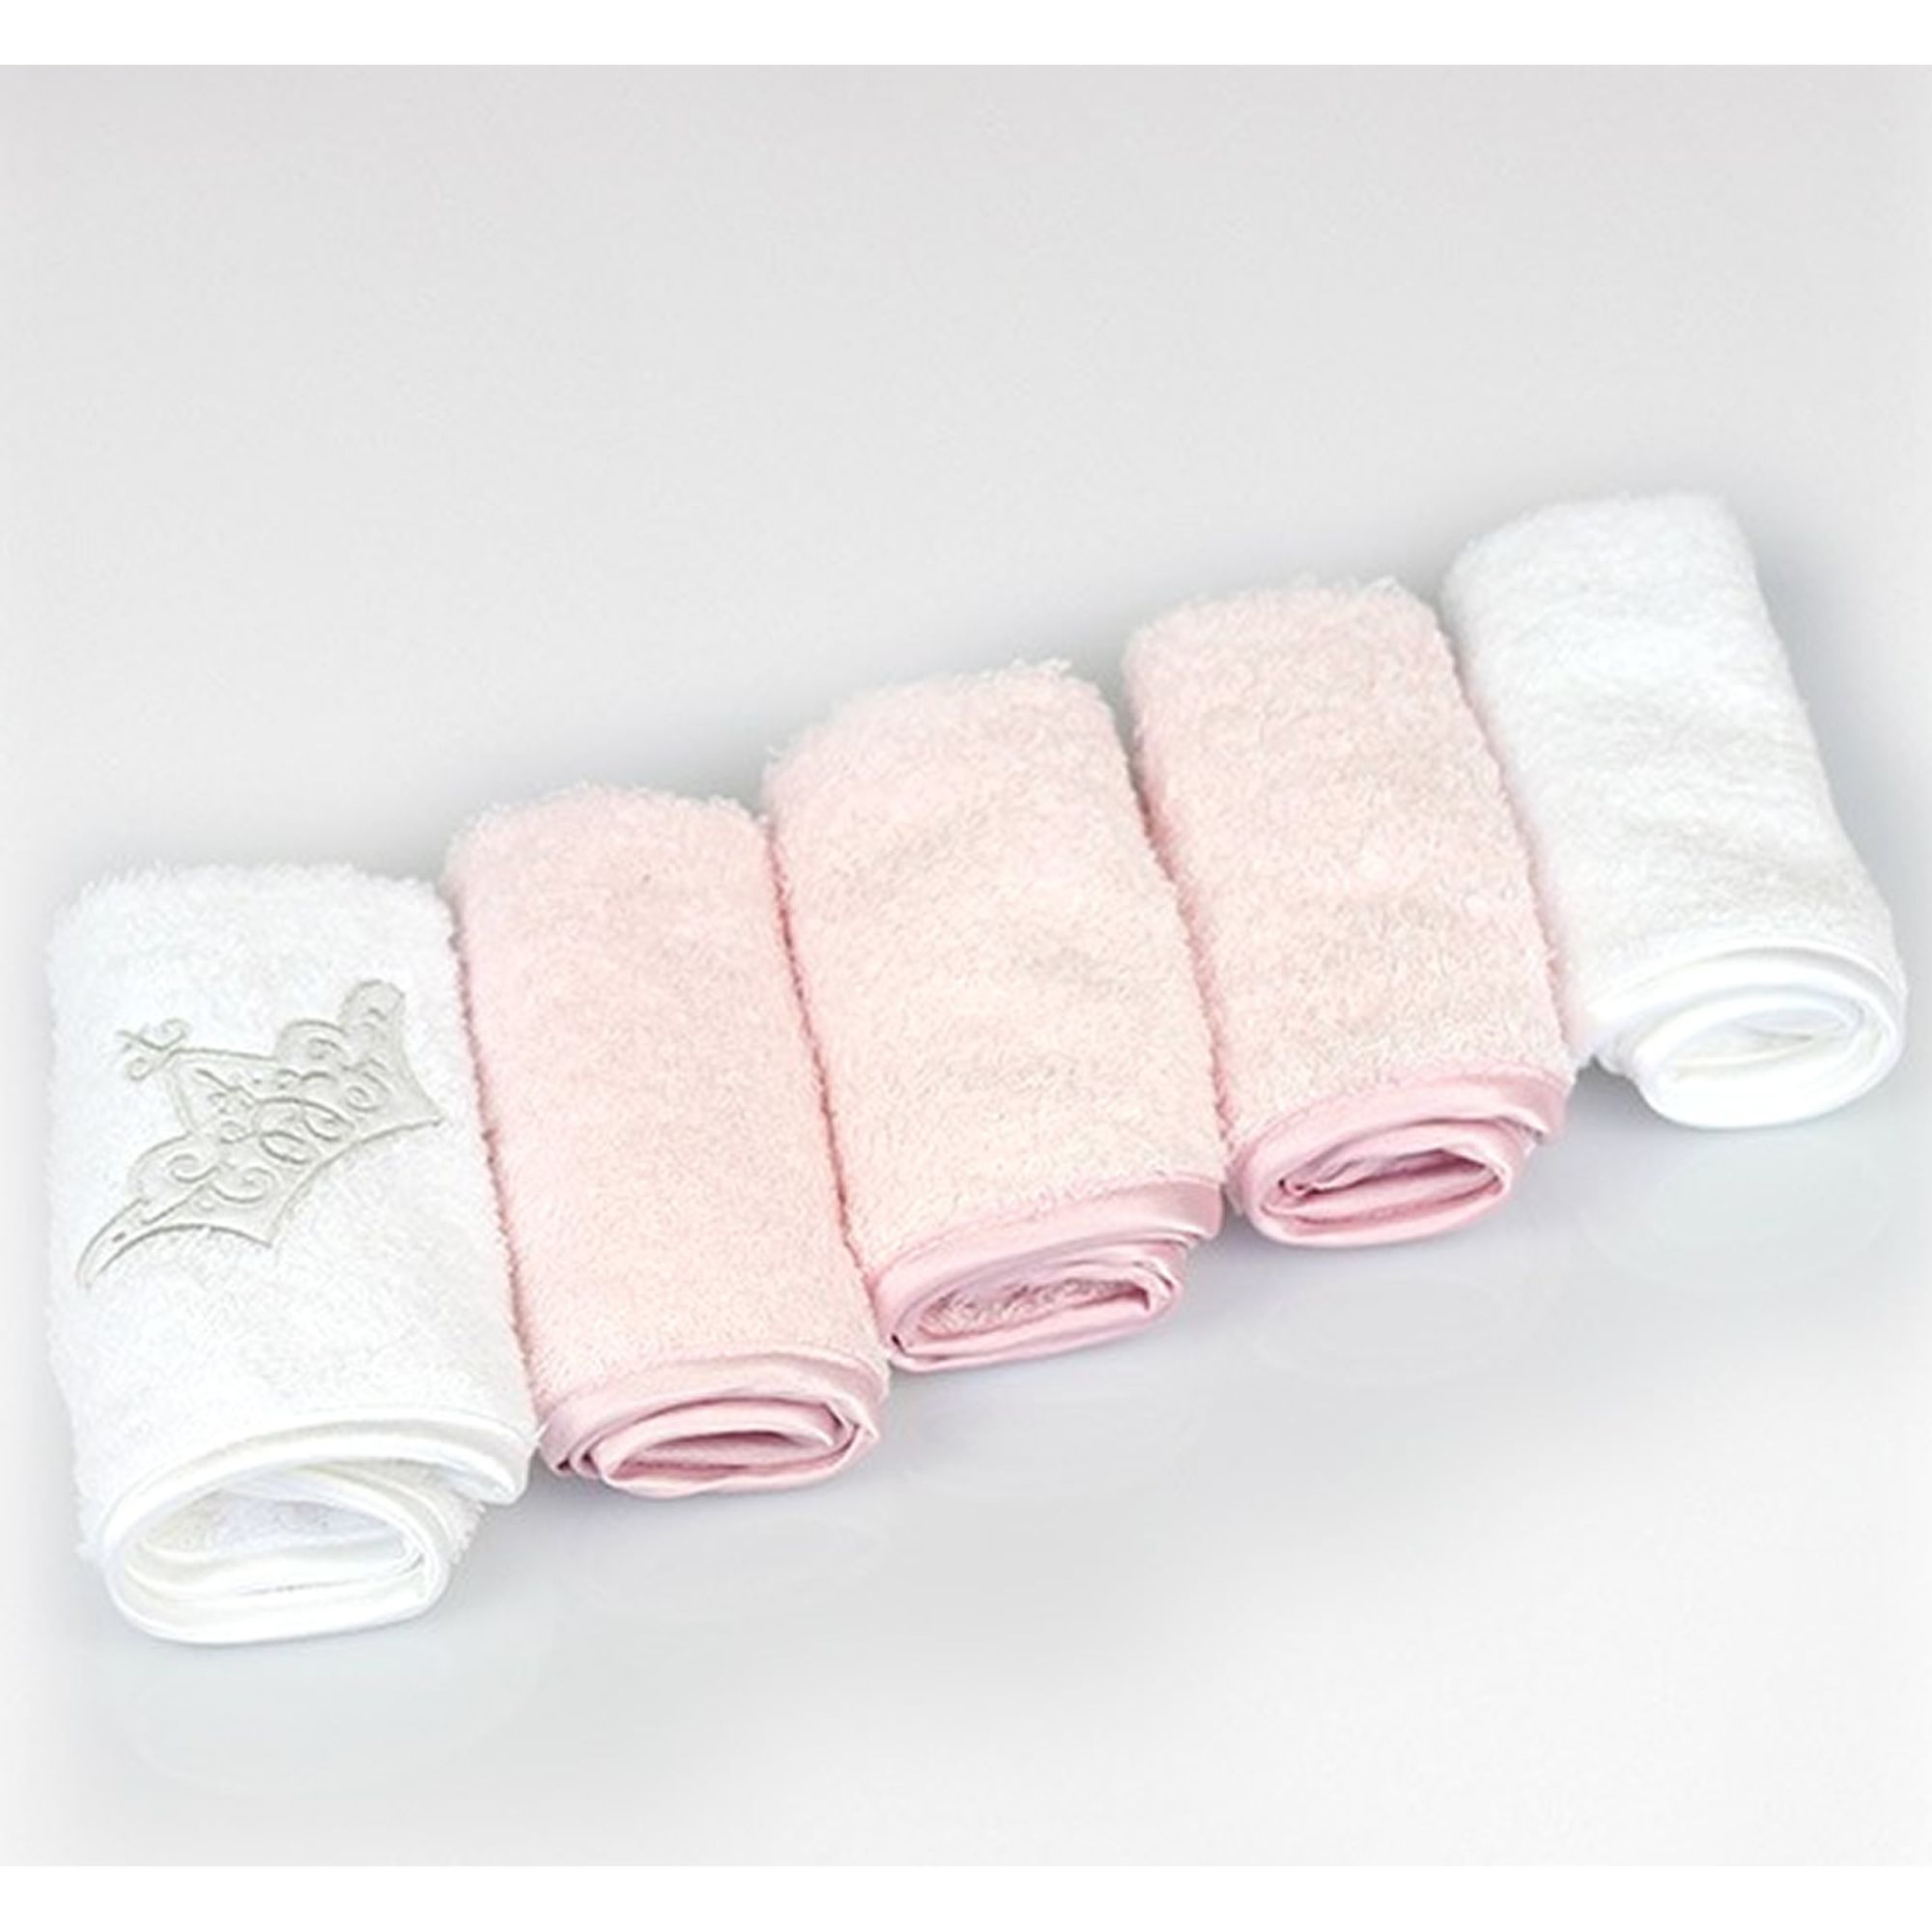 kit-bebe-5-toalhinhas-princesa-rosa-zip-toys